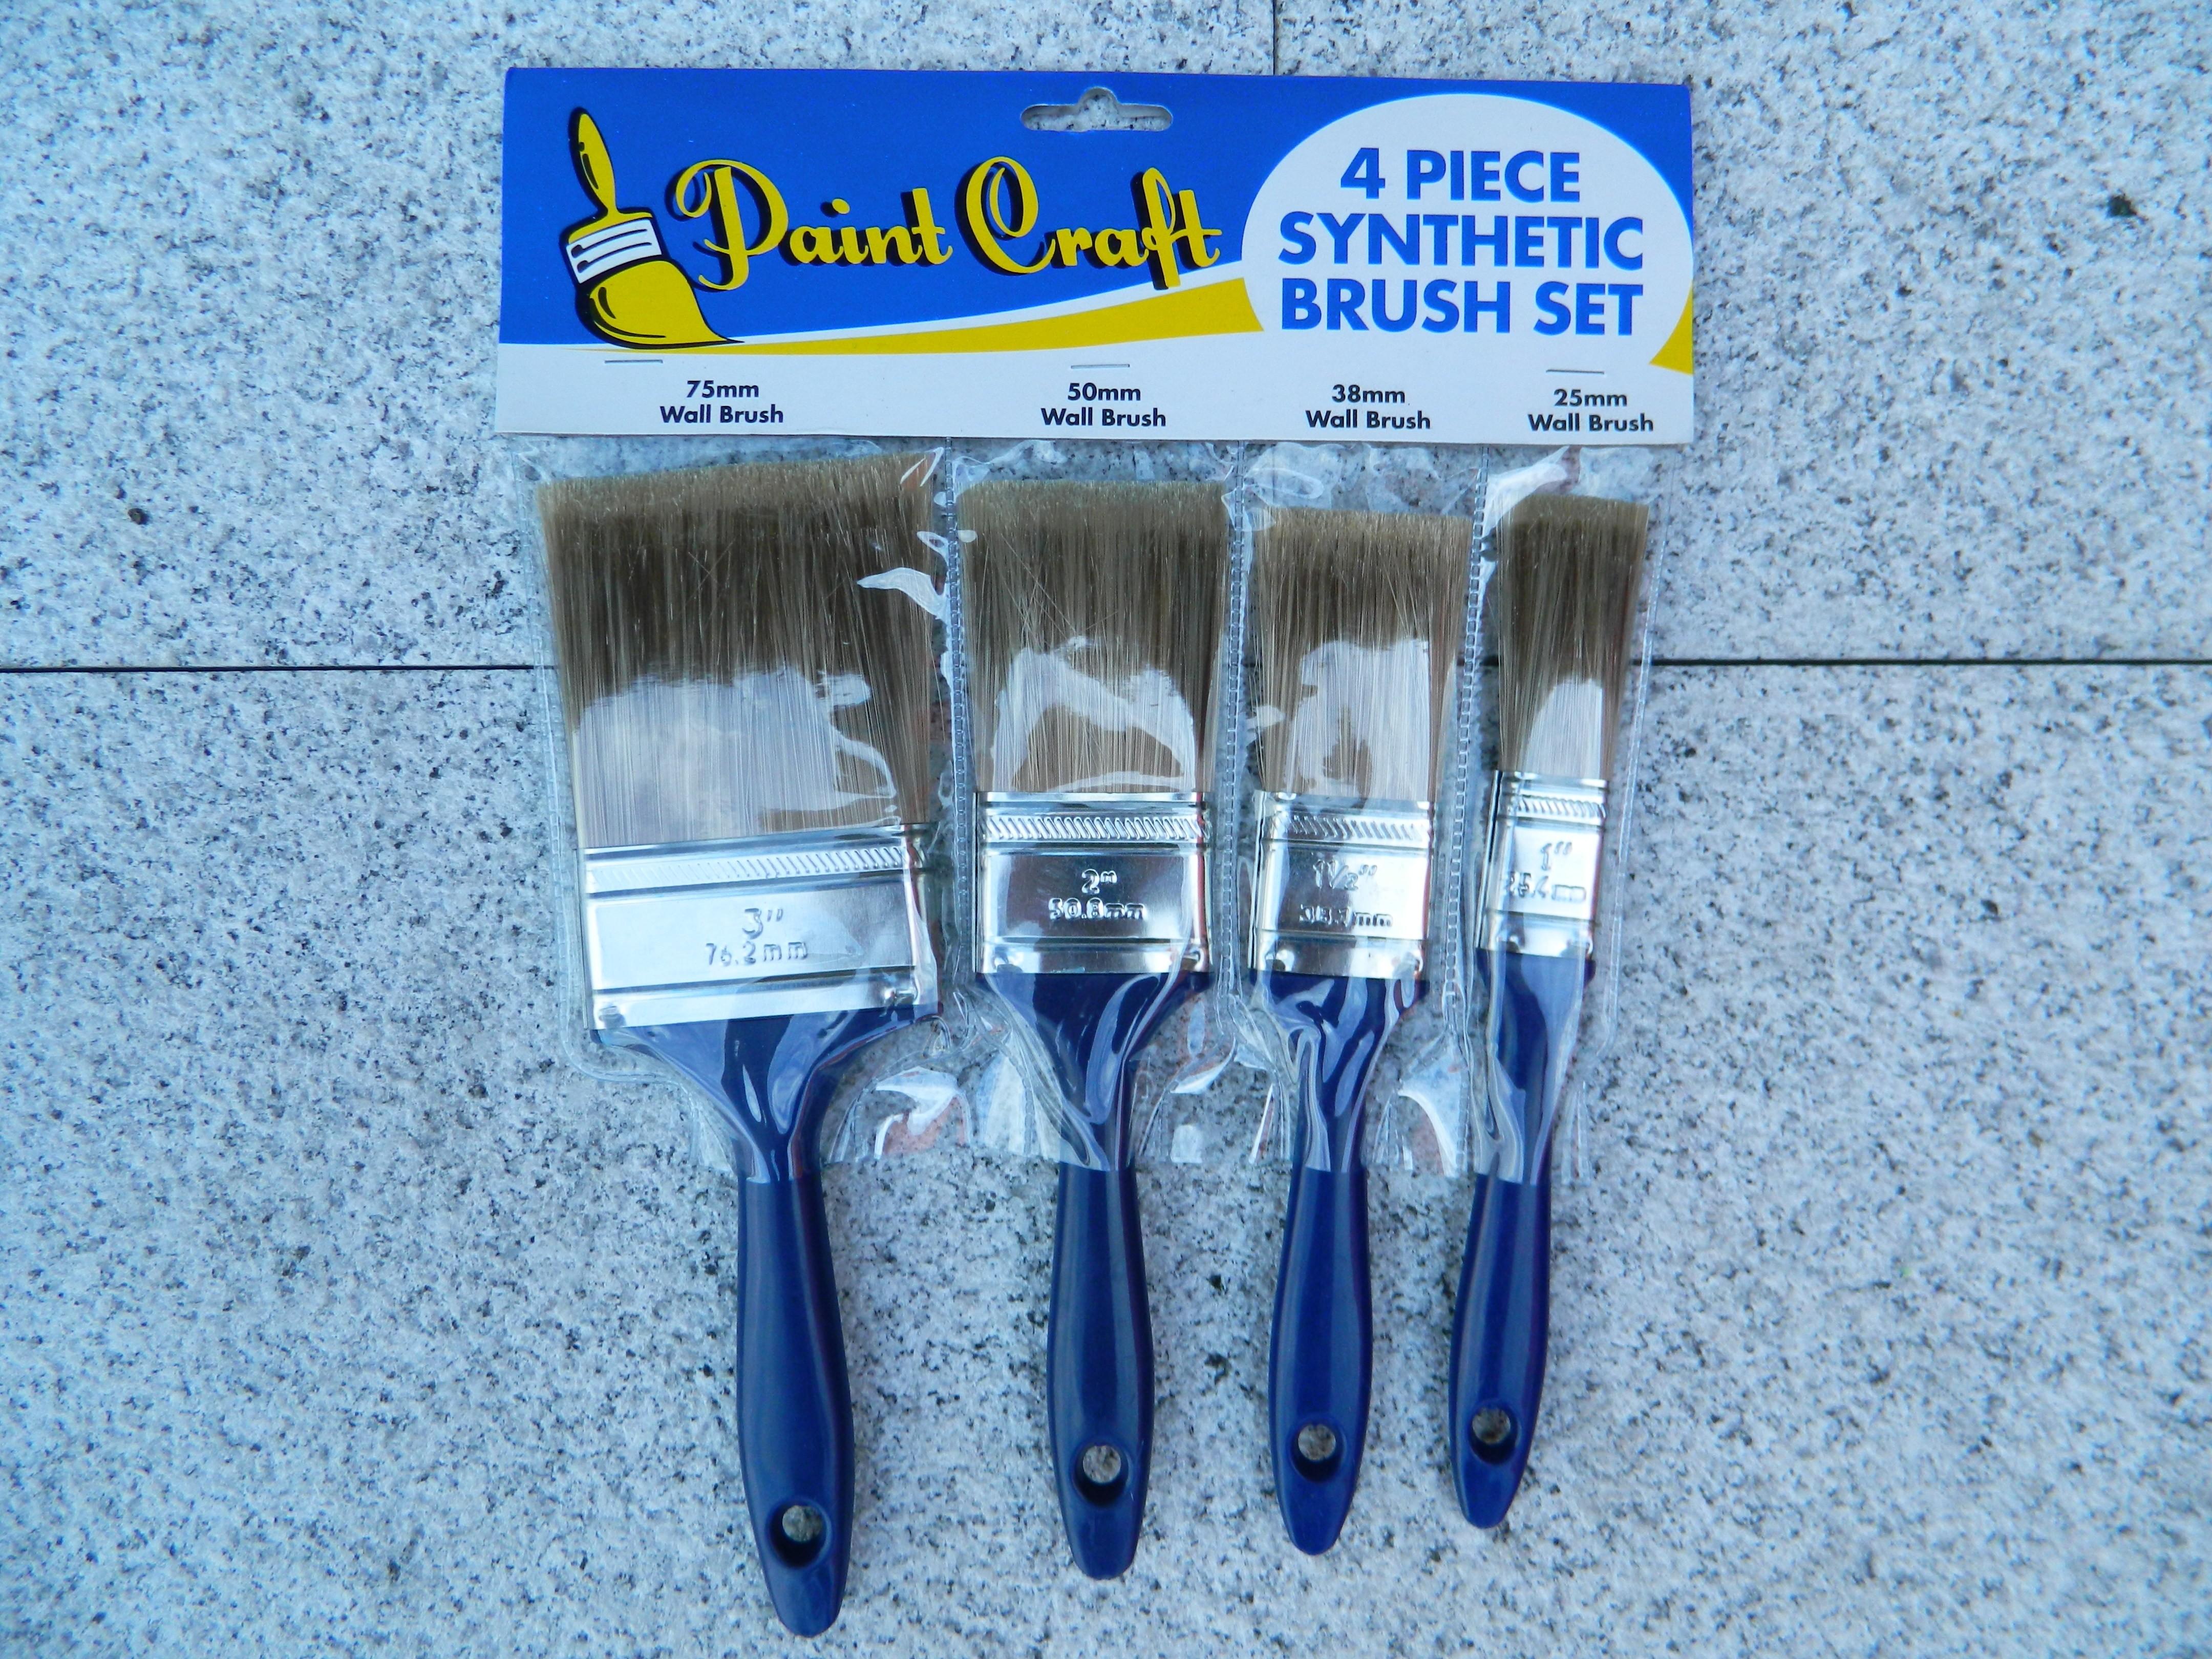 4 Piece Synthetic Brush Set